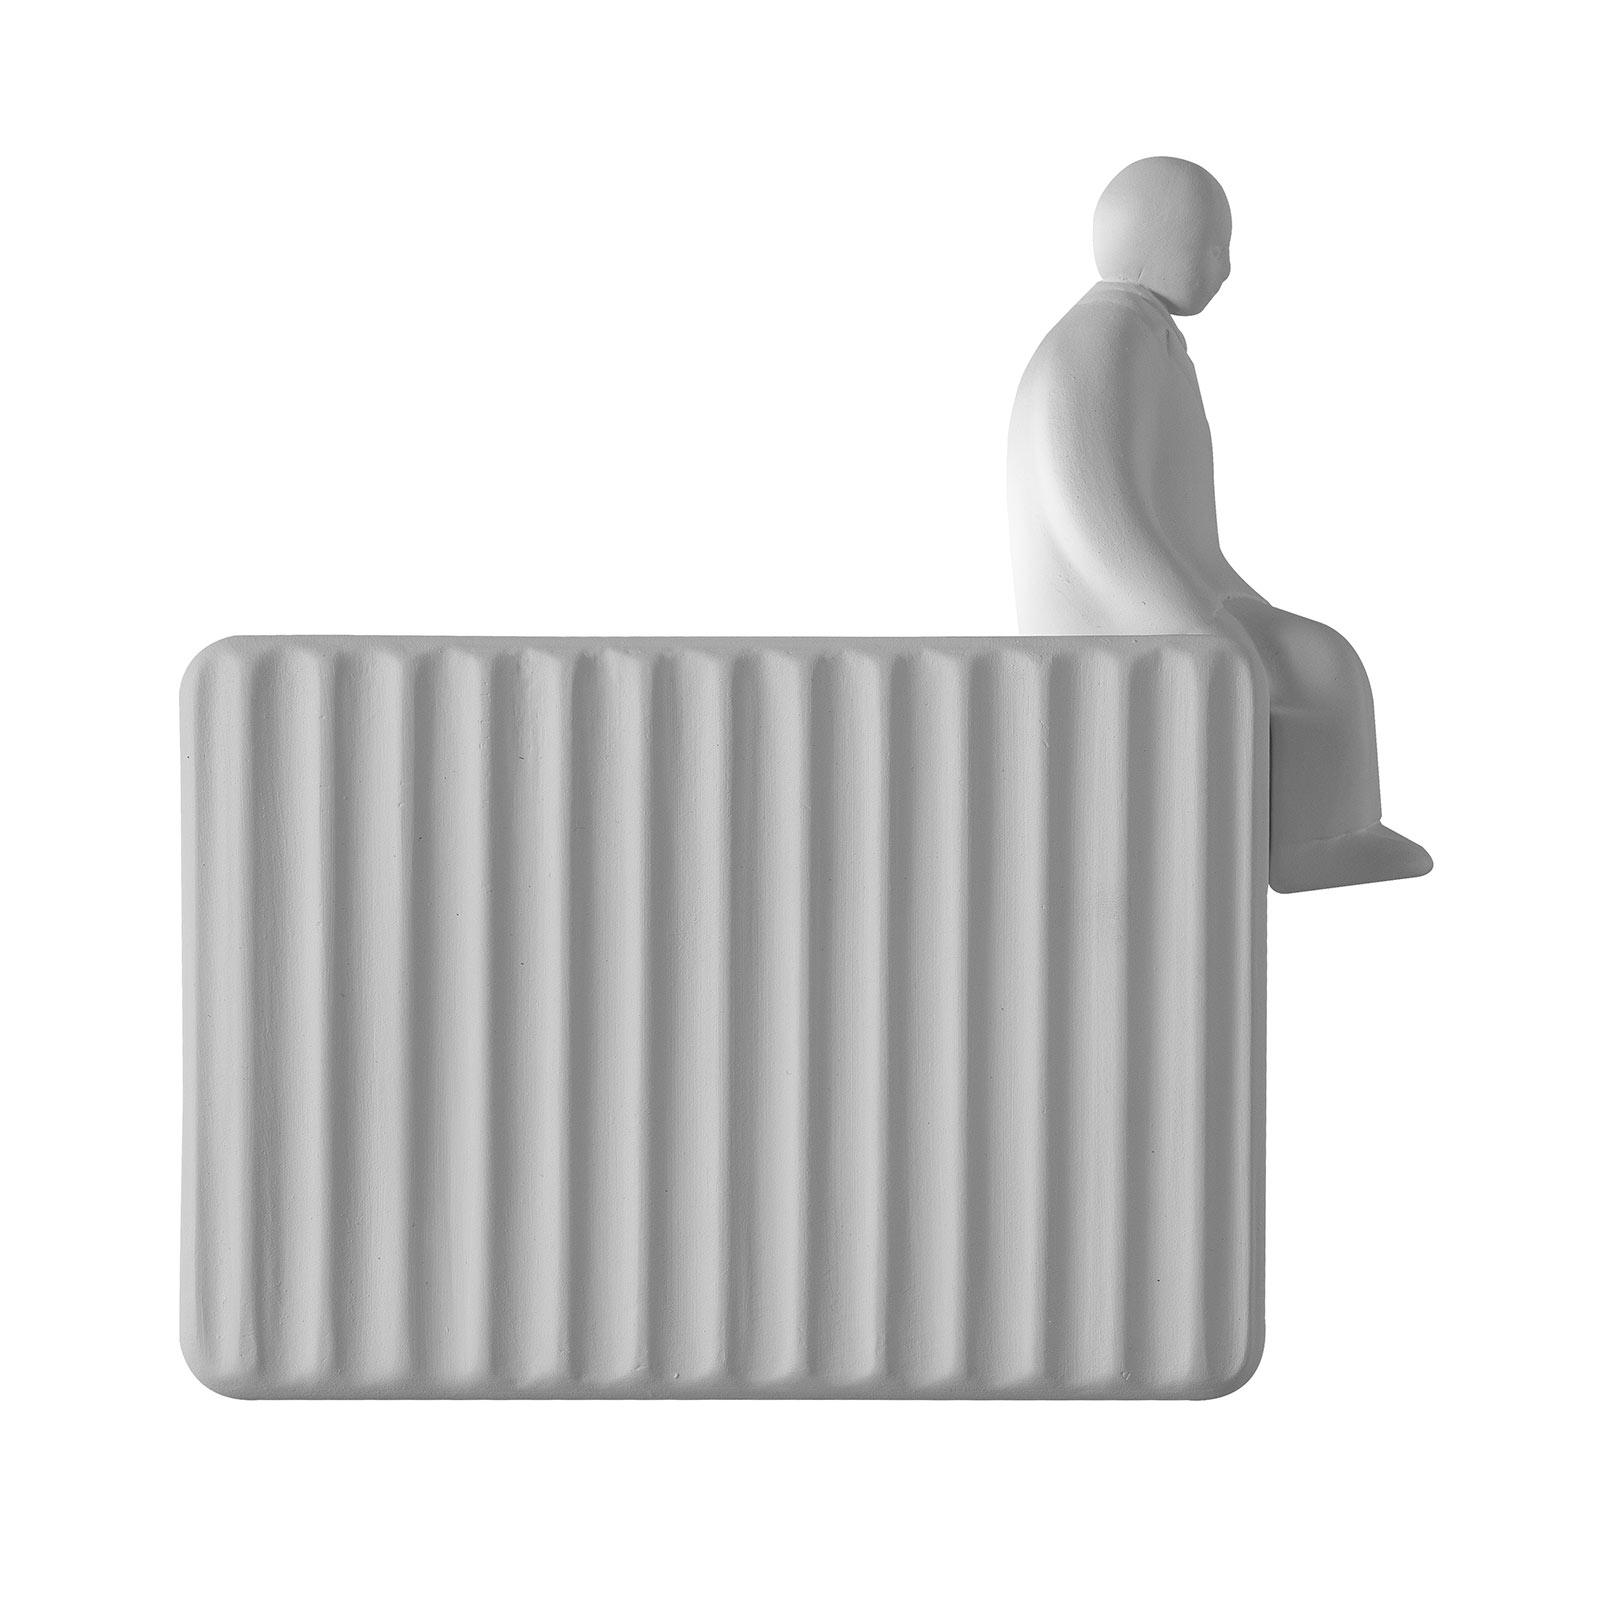 Karman Umarell pyntefigur, høyde 13 cm, sittende